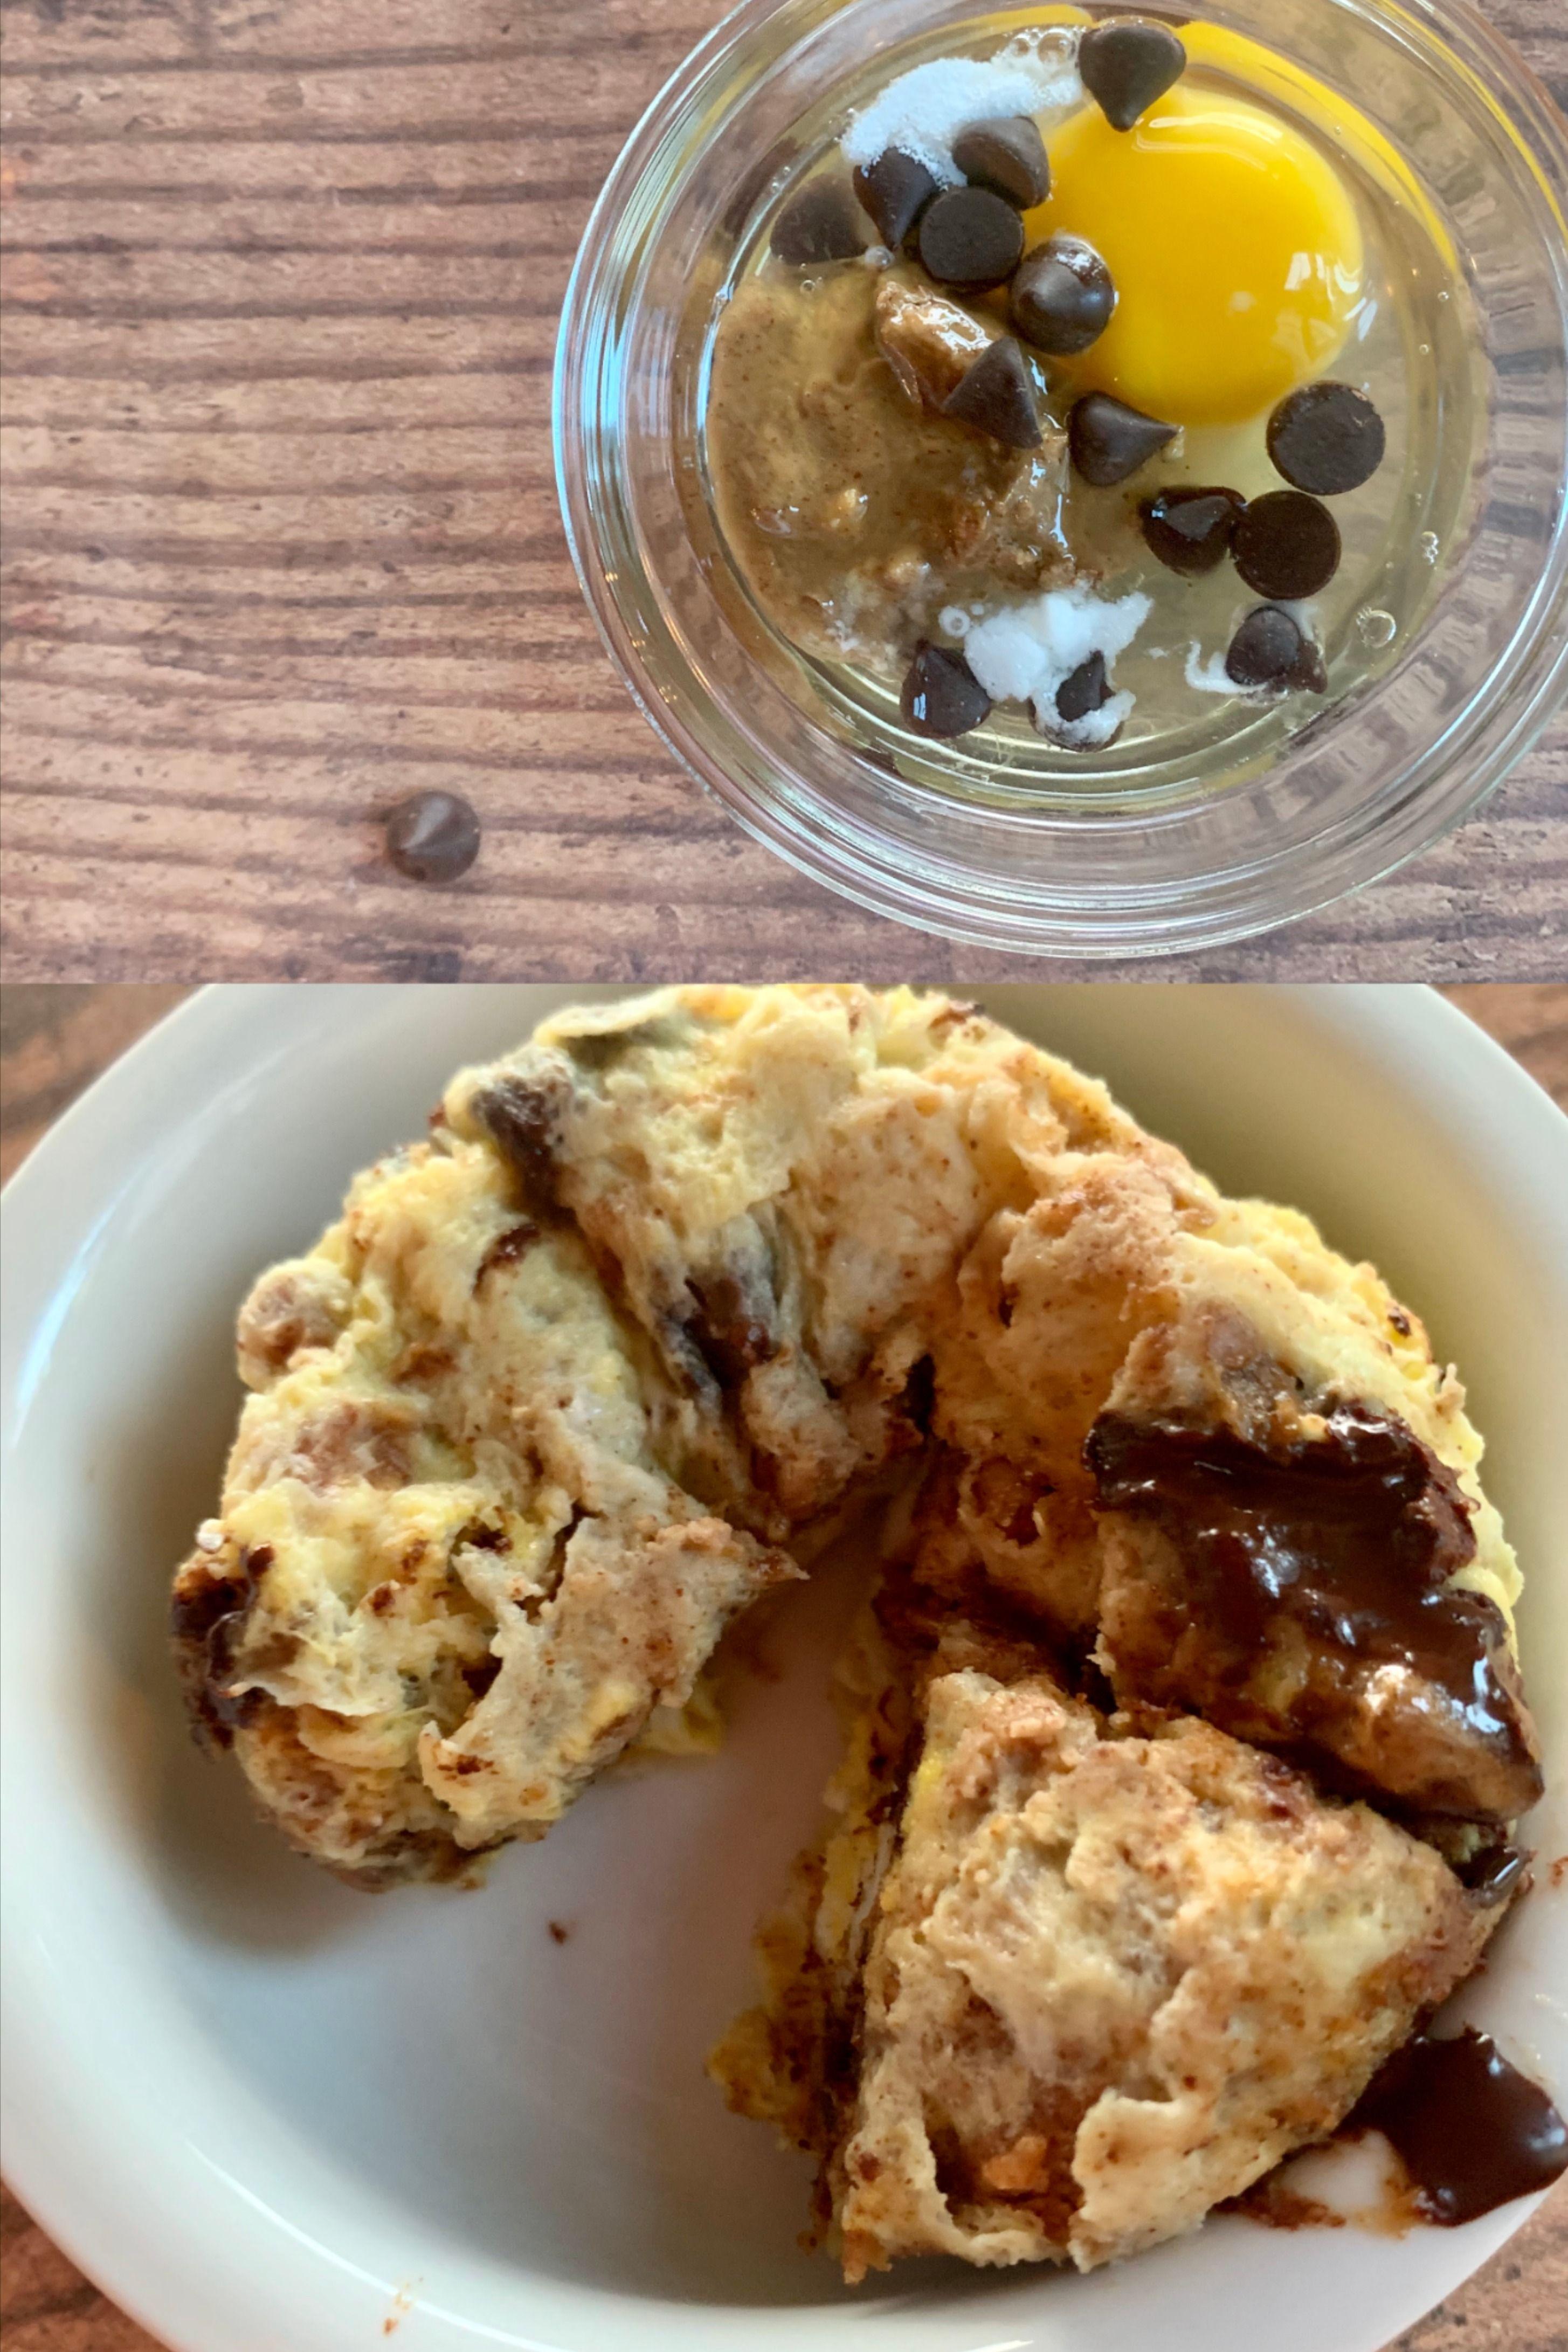 Keto chocolate chip mug cake | Recipe (With images) | Keto ...